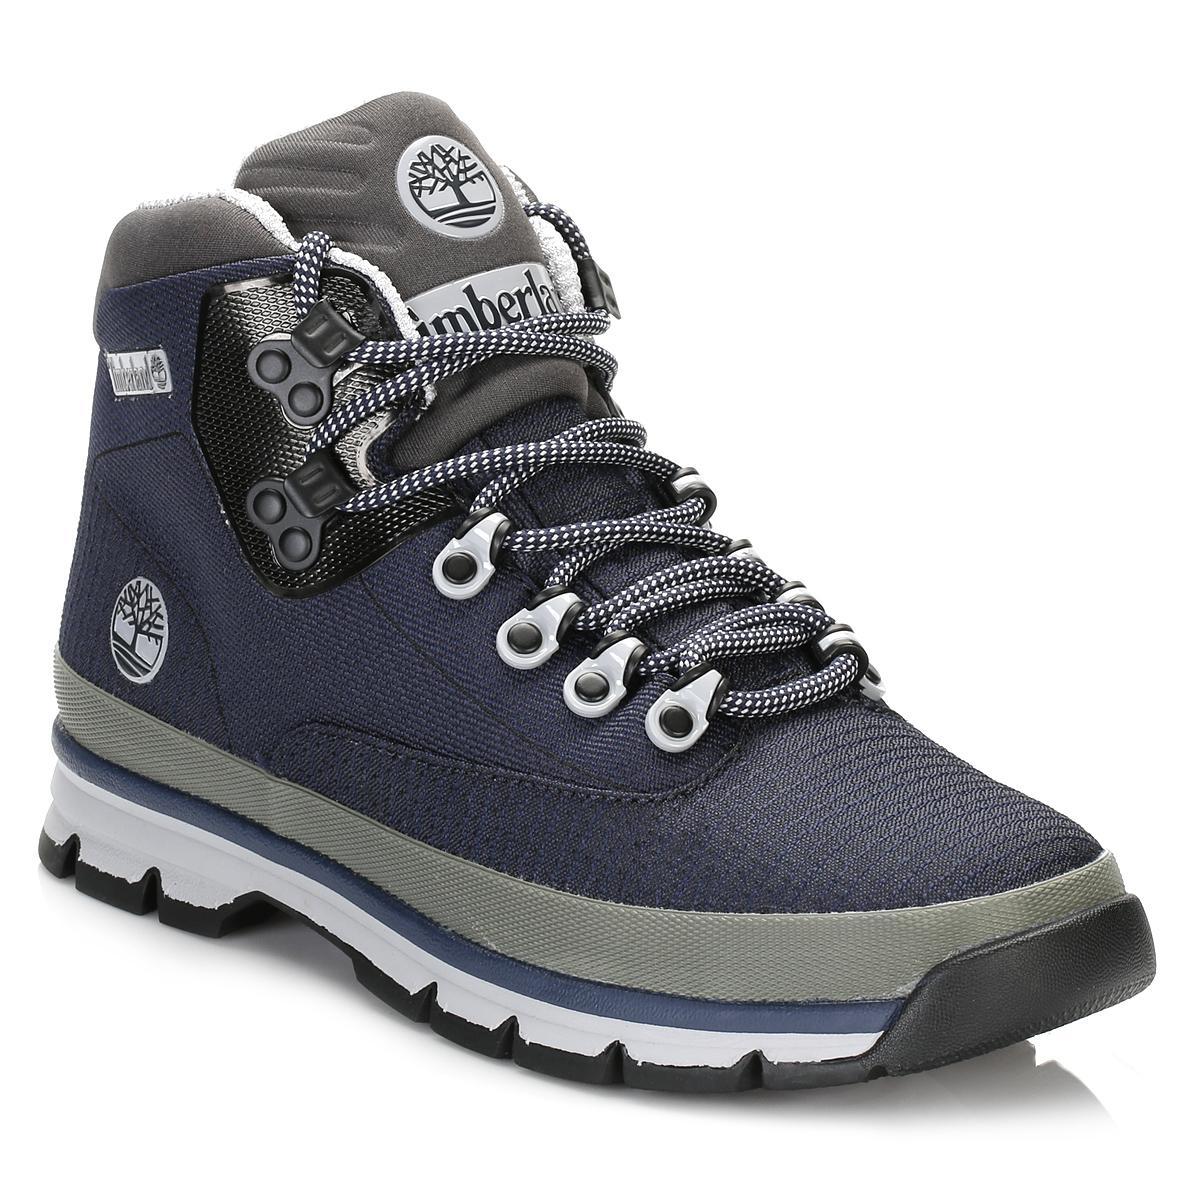 Mens Black Iris Euro Hiker Jacquard Boots